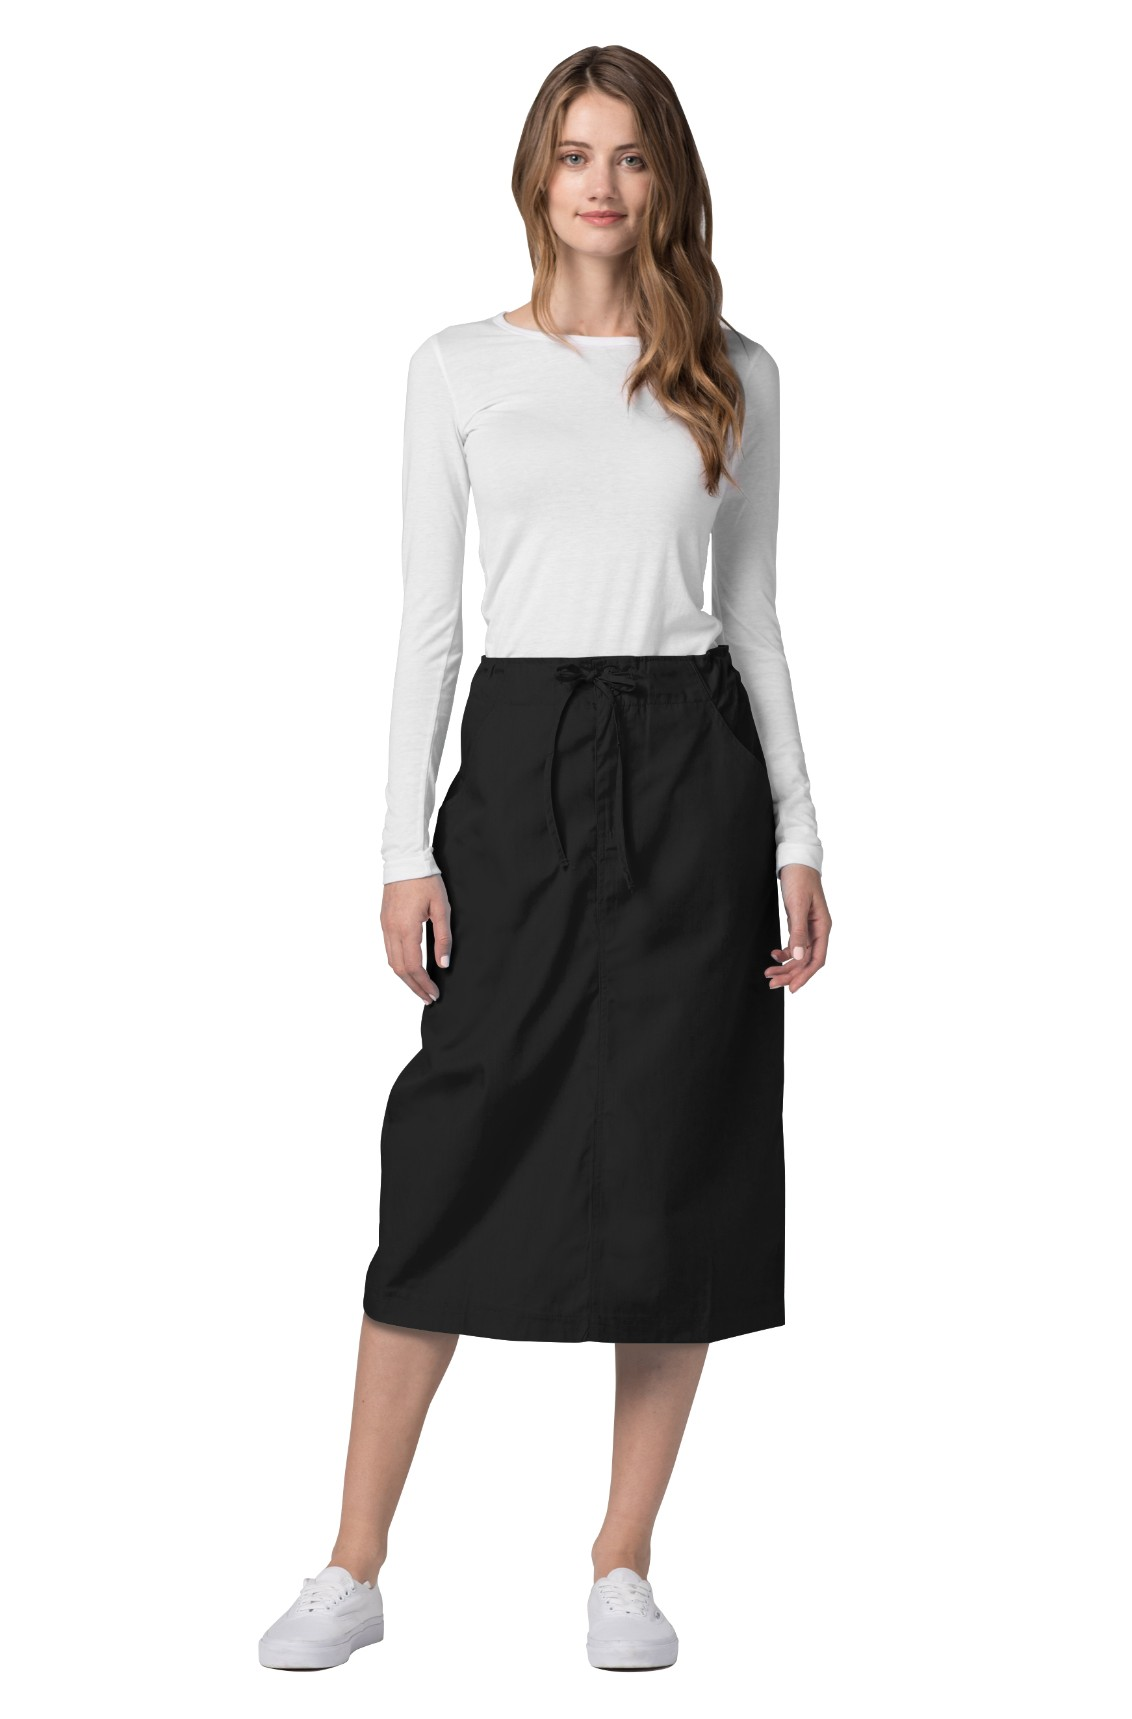 5c4e82f7fbb6 Buy Adar Universal Mid-Calf Length Drawstring Skirt - Adar Medical ...